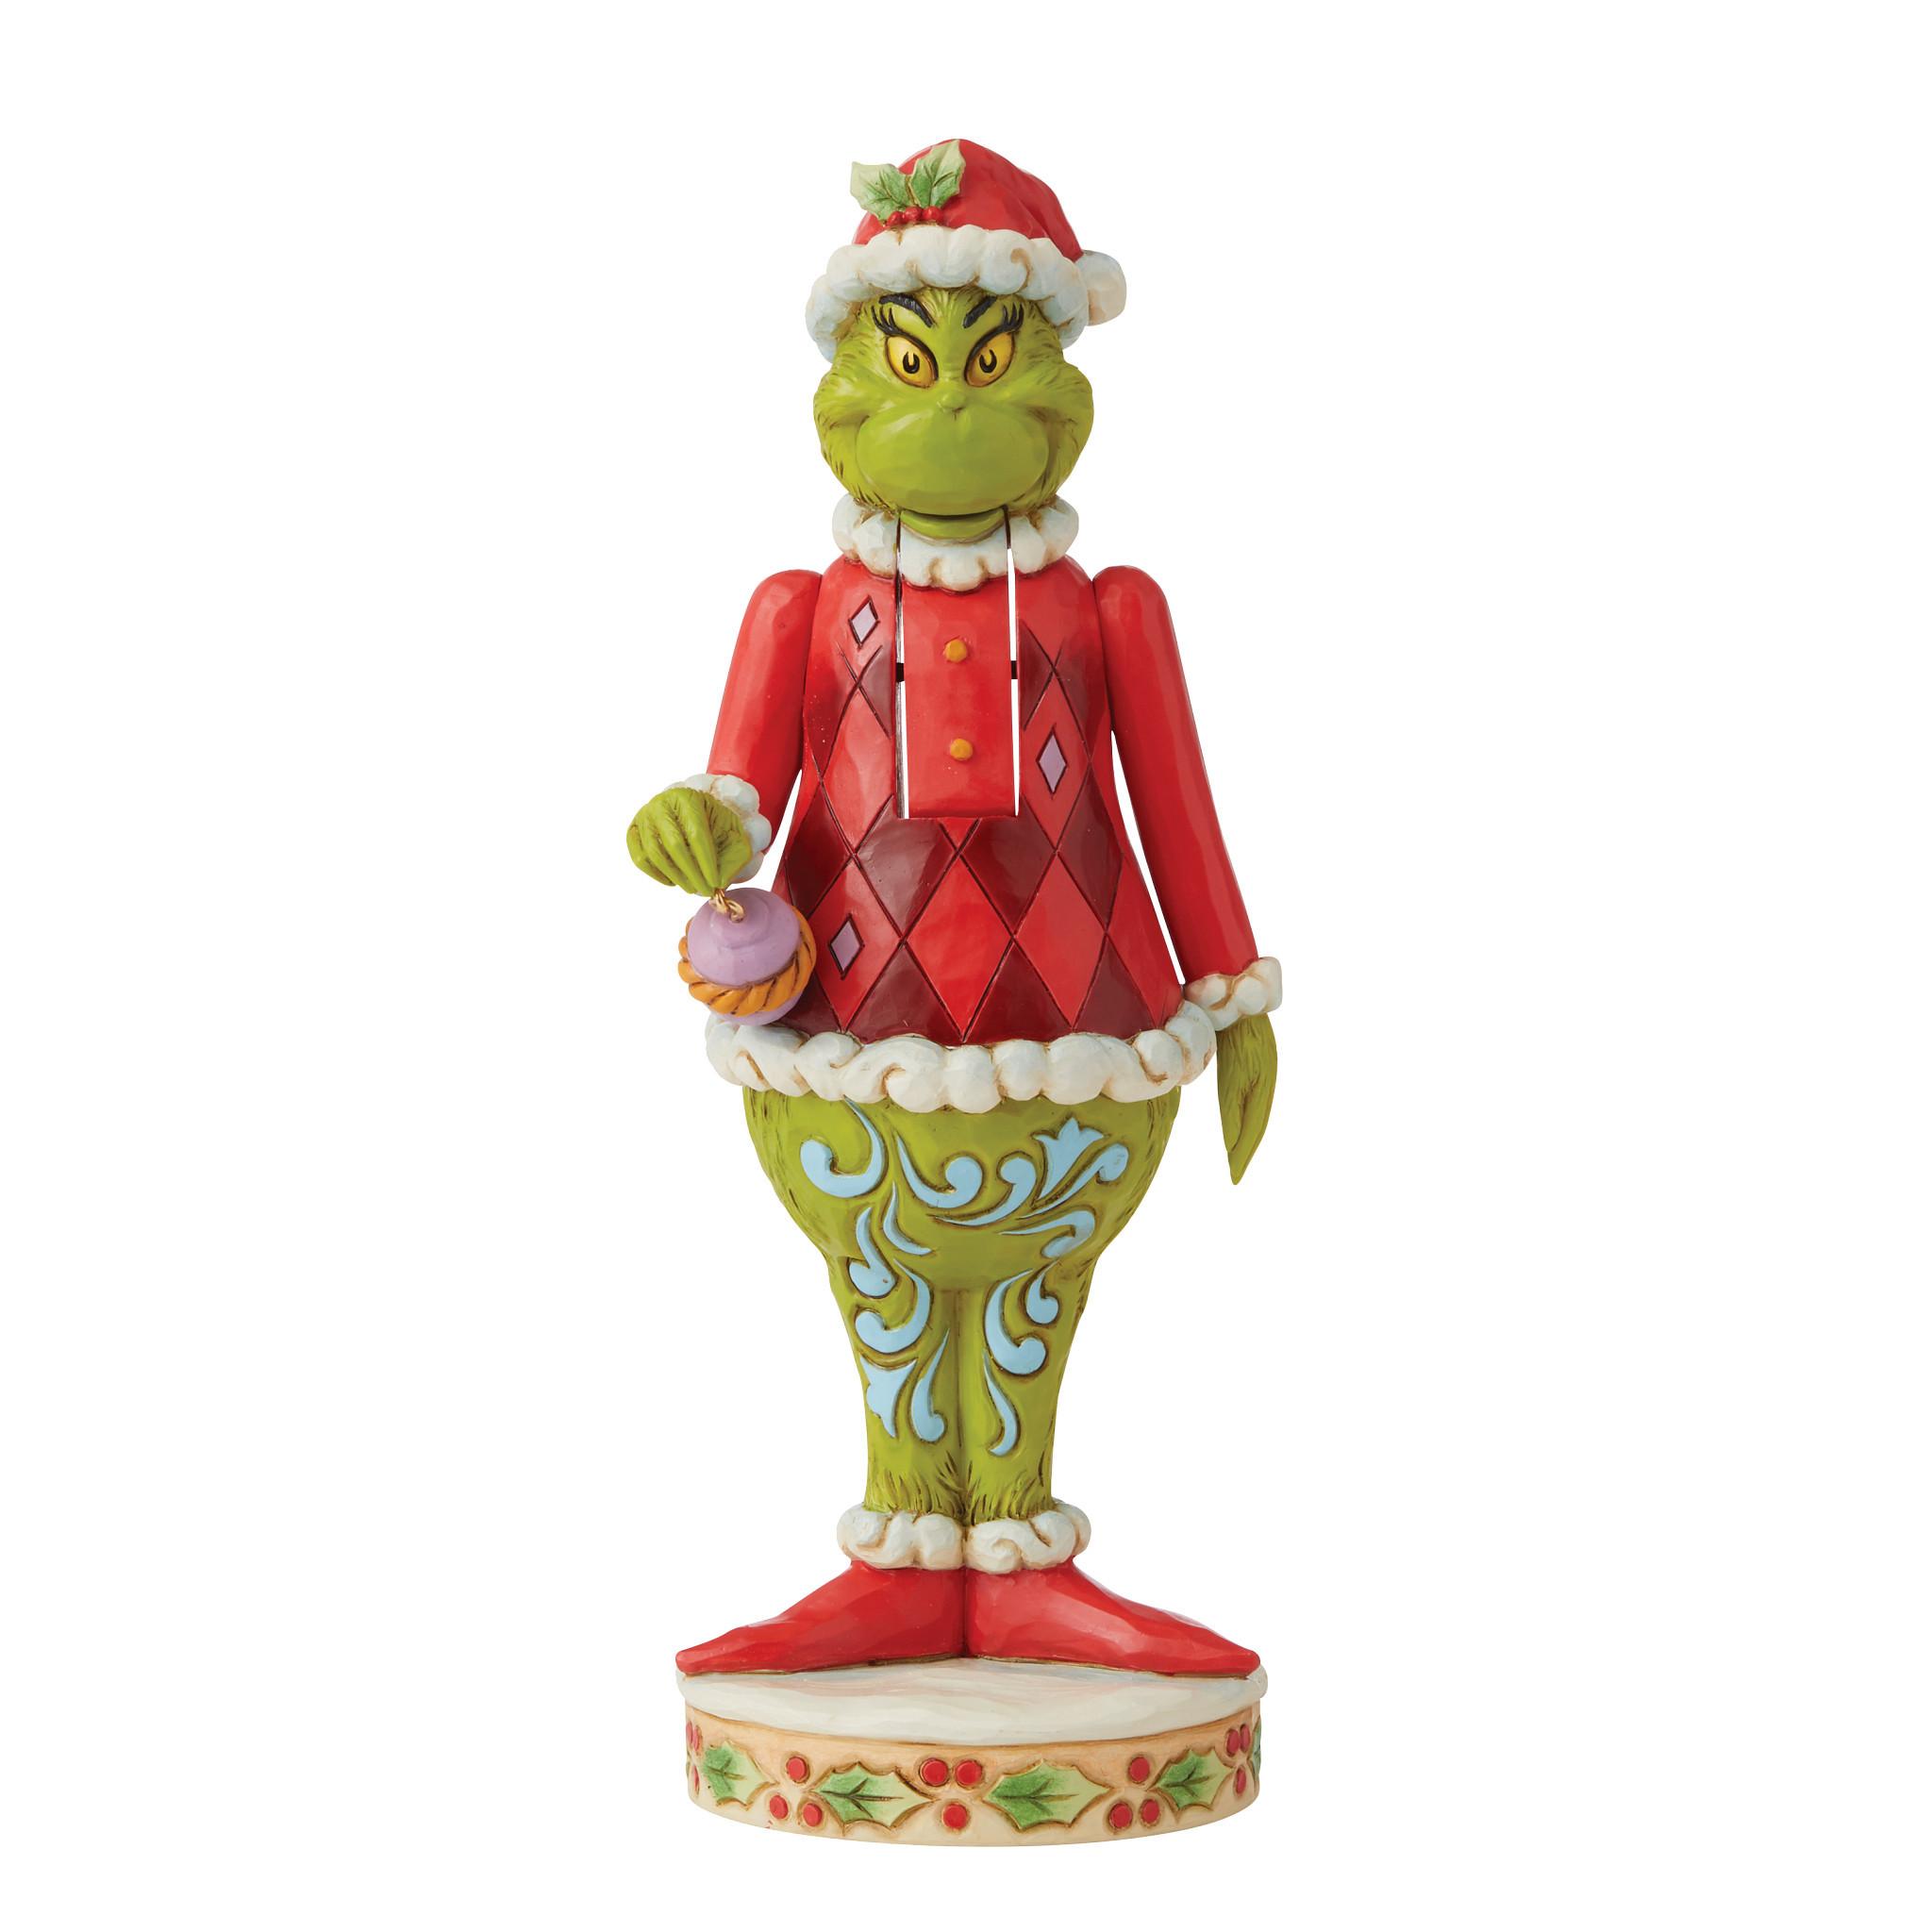 Jim Shore - Figurines 'Grinch Nutcracker N' 2021